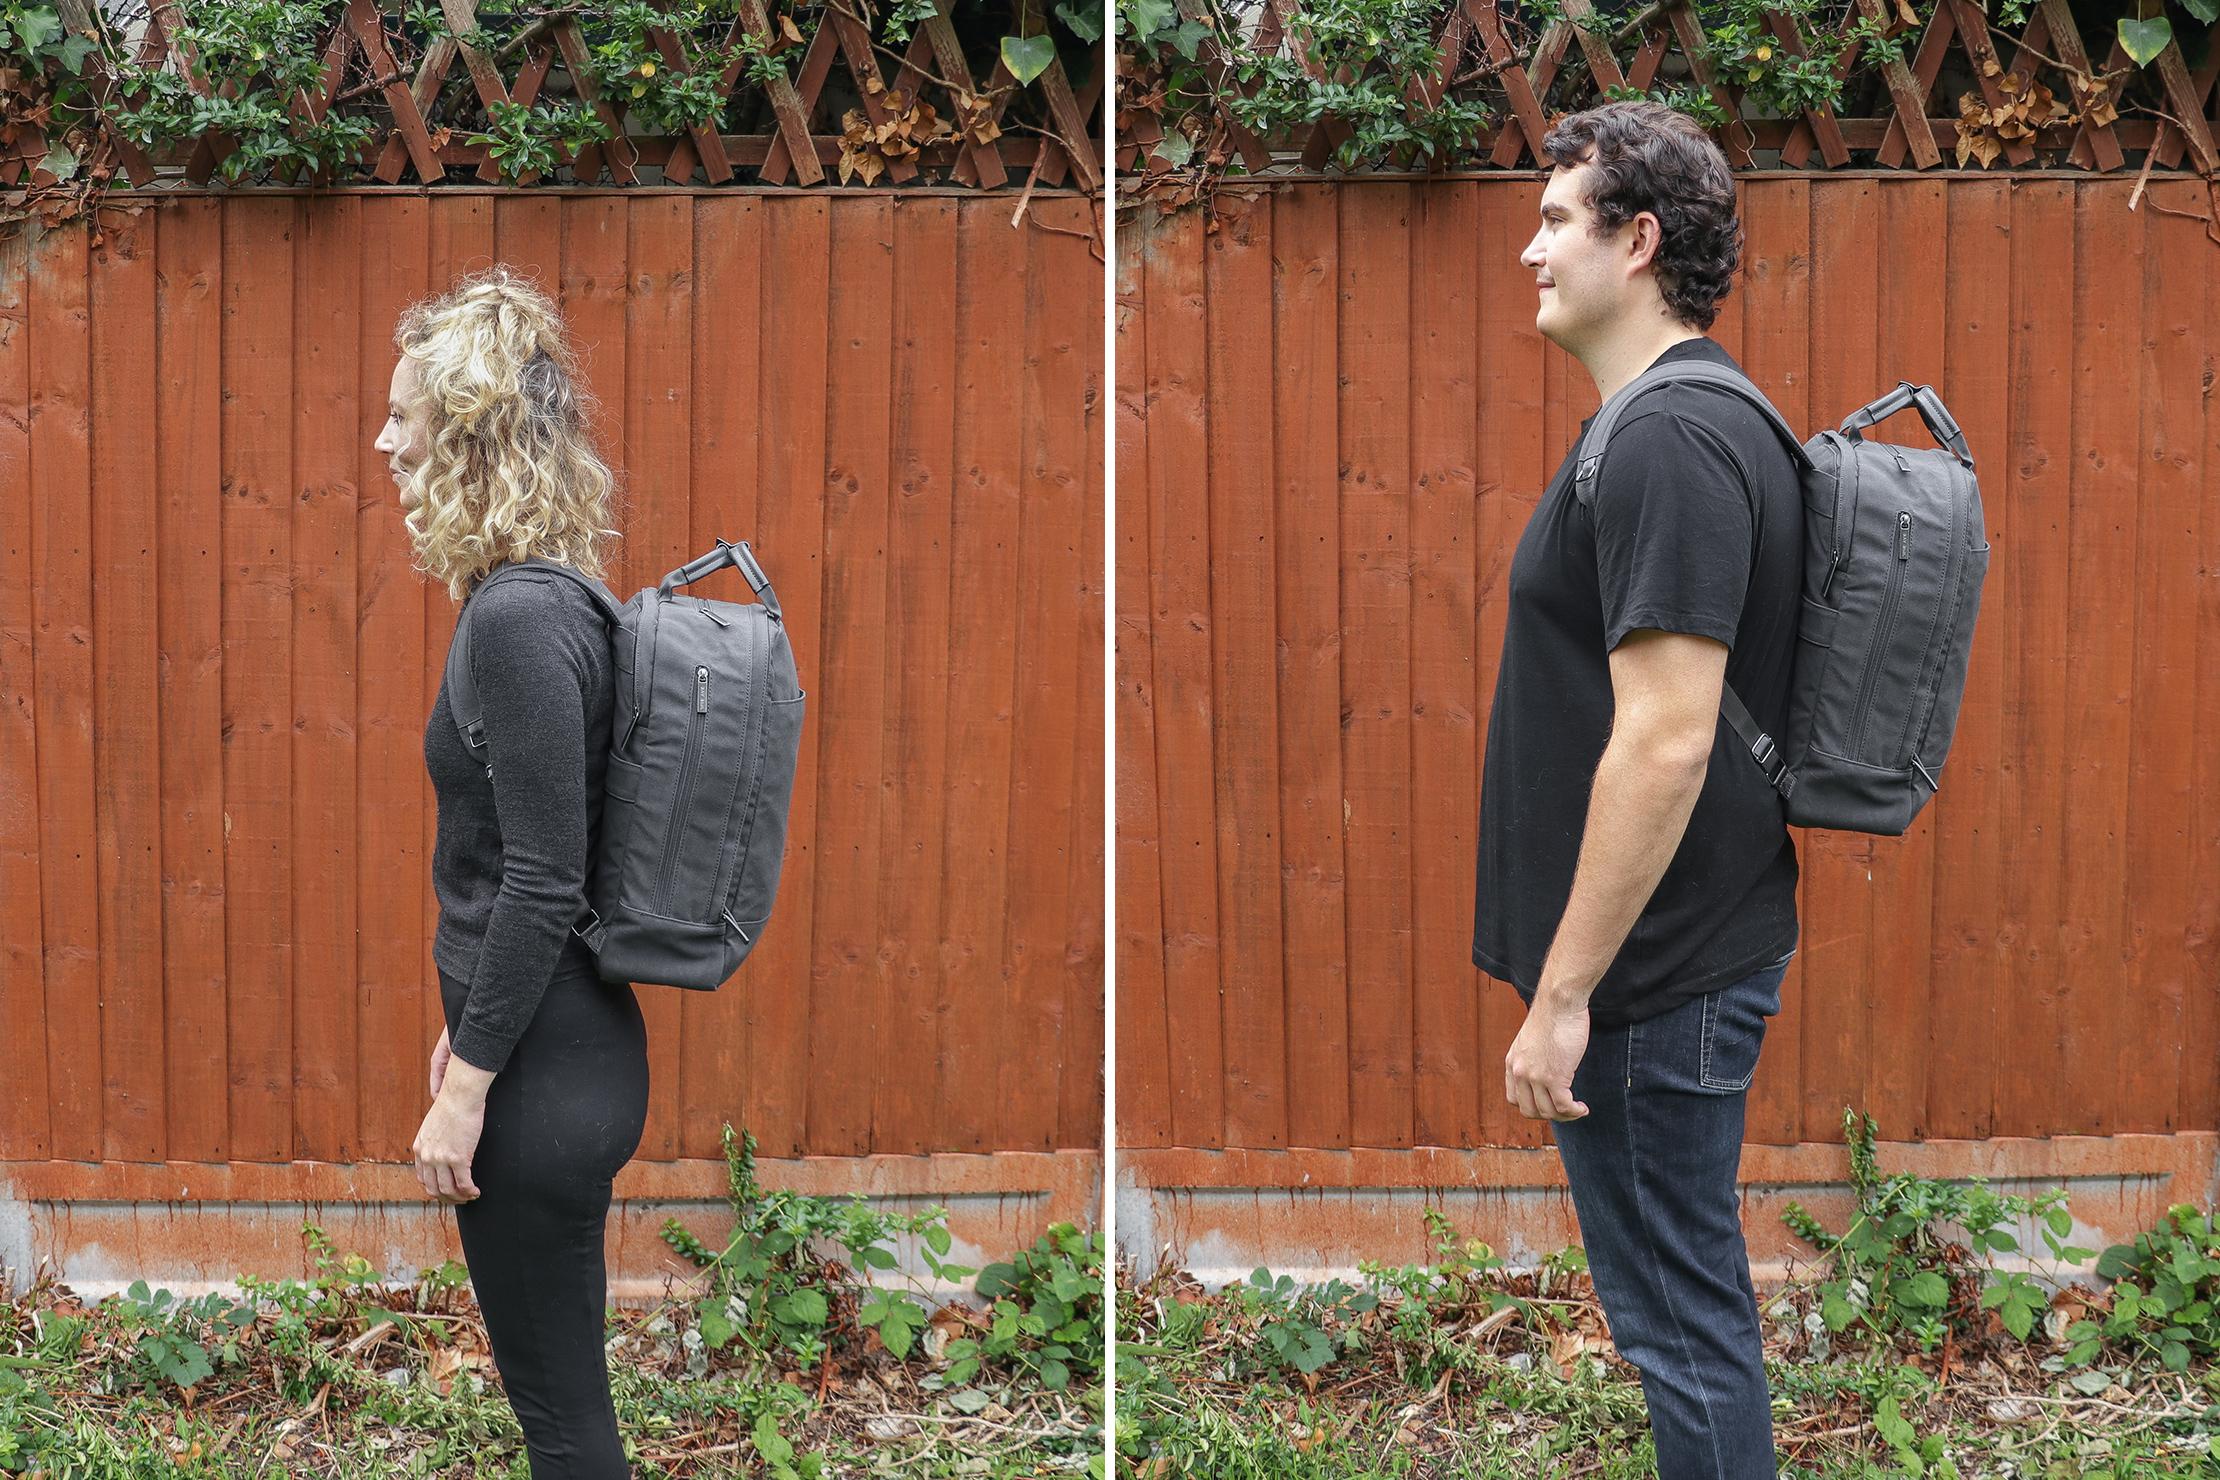 "Left: Rebecca, Height: 5'7"" (170 cm), Torso: 16"" (41 cm) | Right: Nathan, Height: 6'4"" (193 cm), Torso: 19"" (48 cm)"